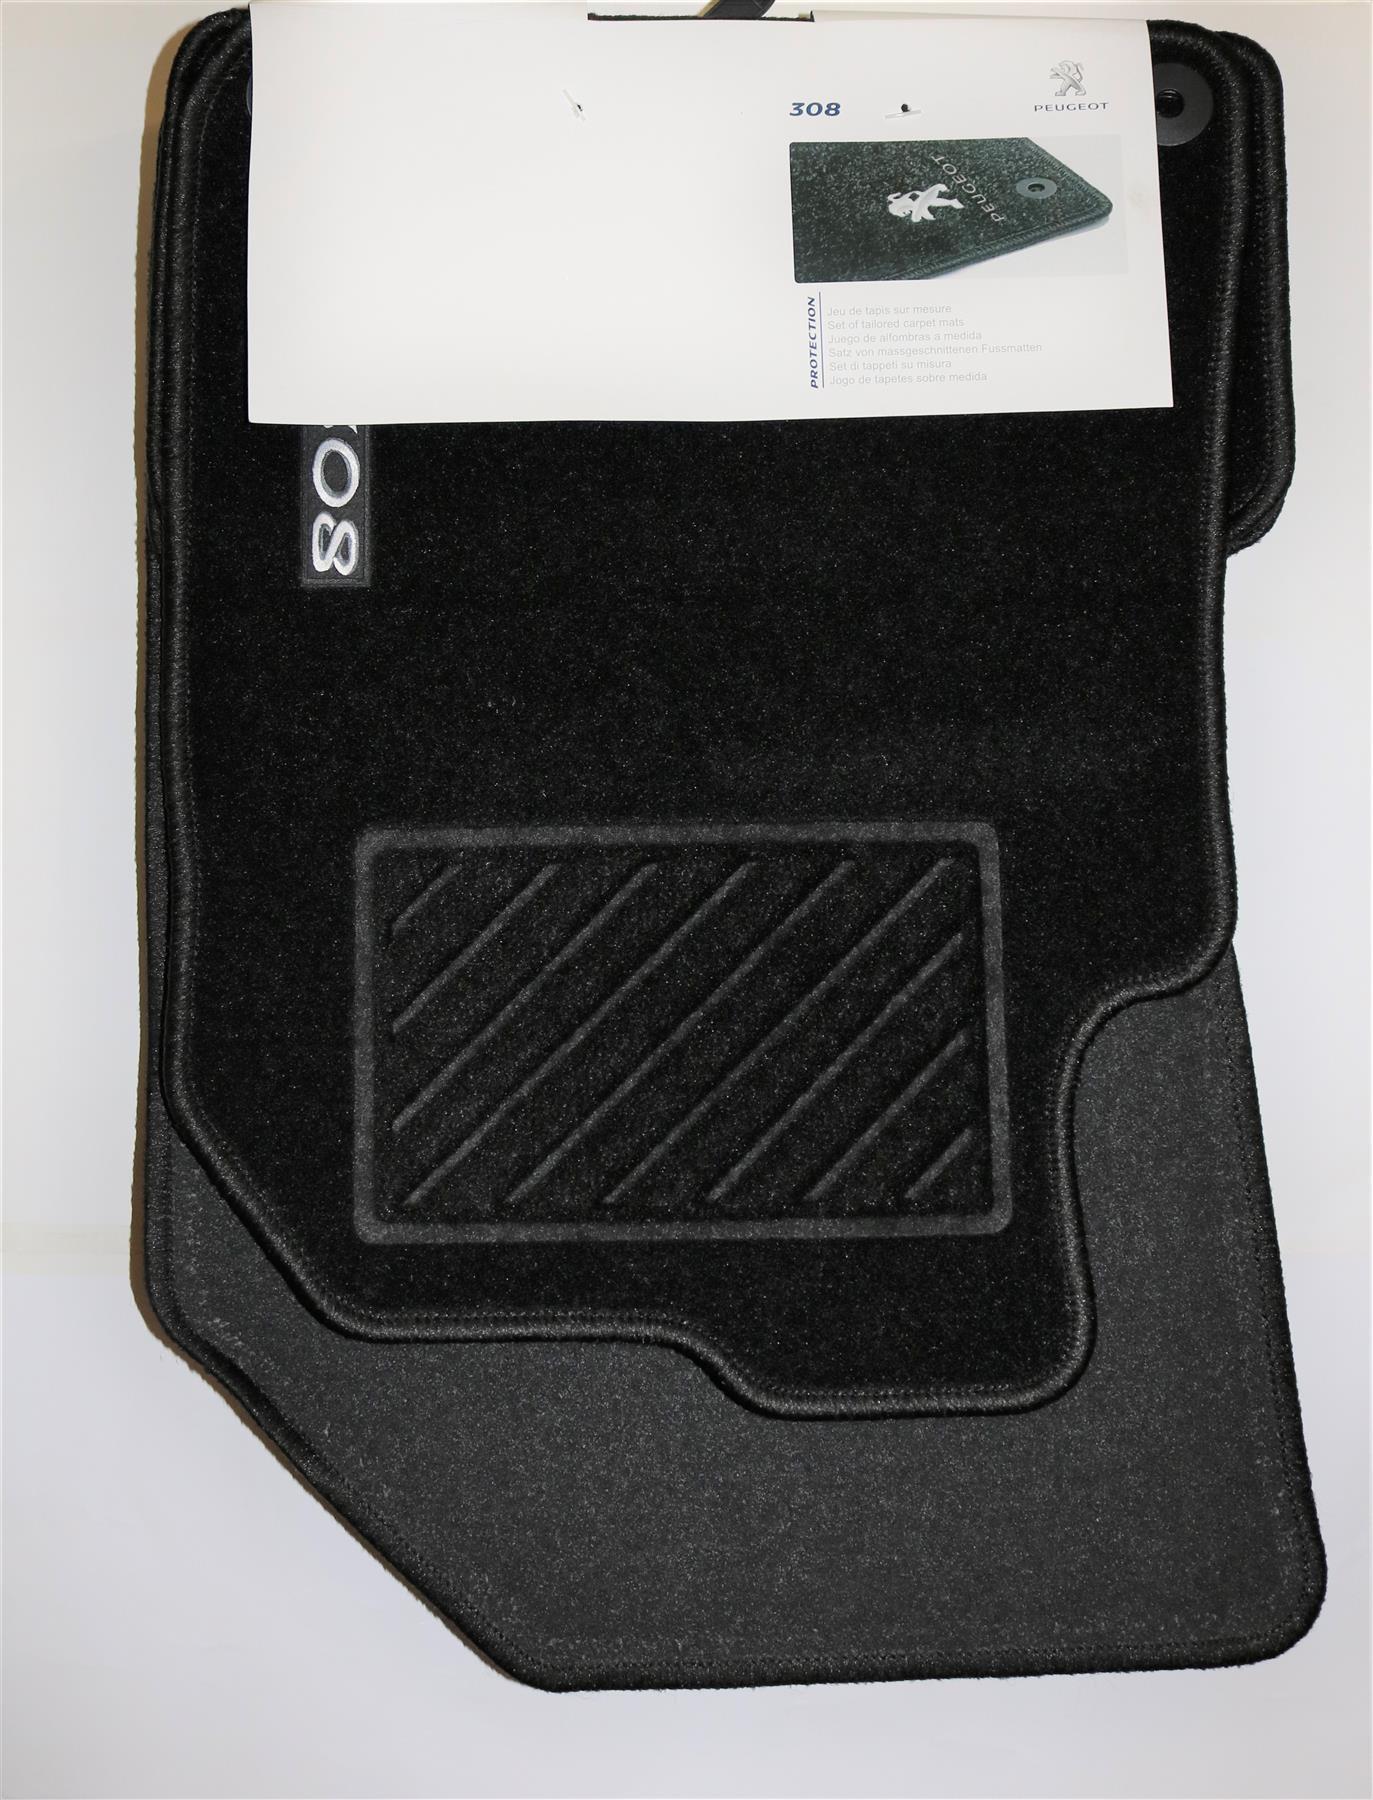 PSA Original Juego de 4 Tapetes Alfombra estándar se ajusta Peugeot 308 160985188 0